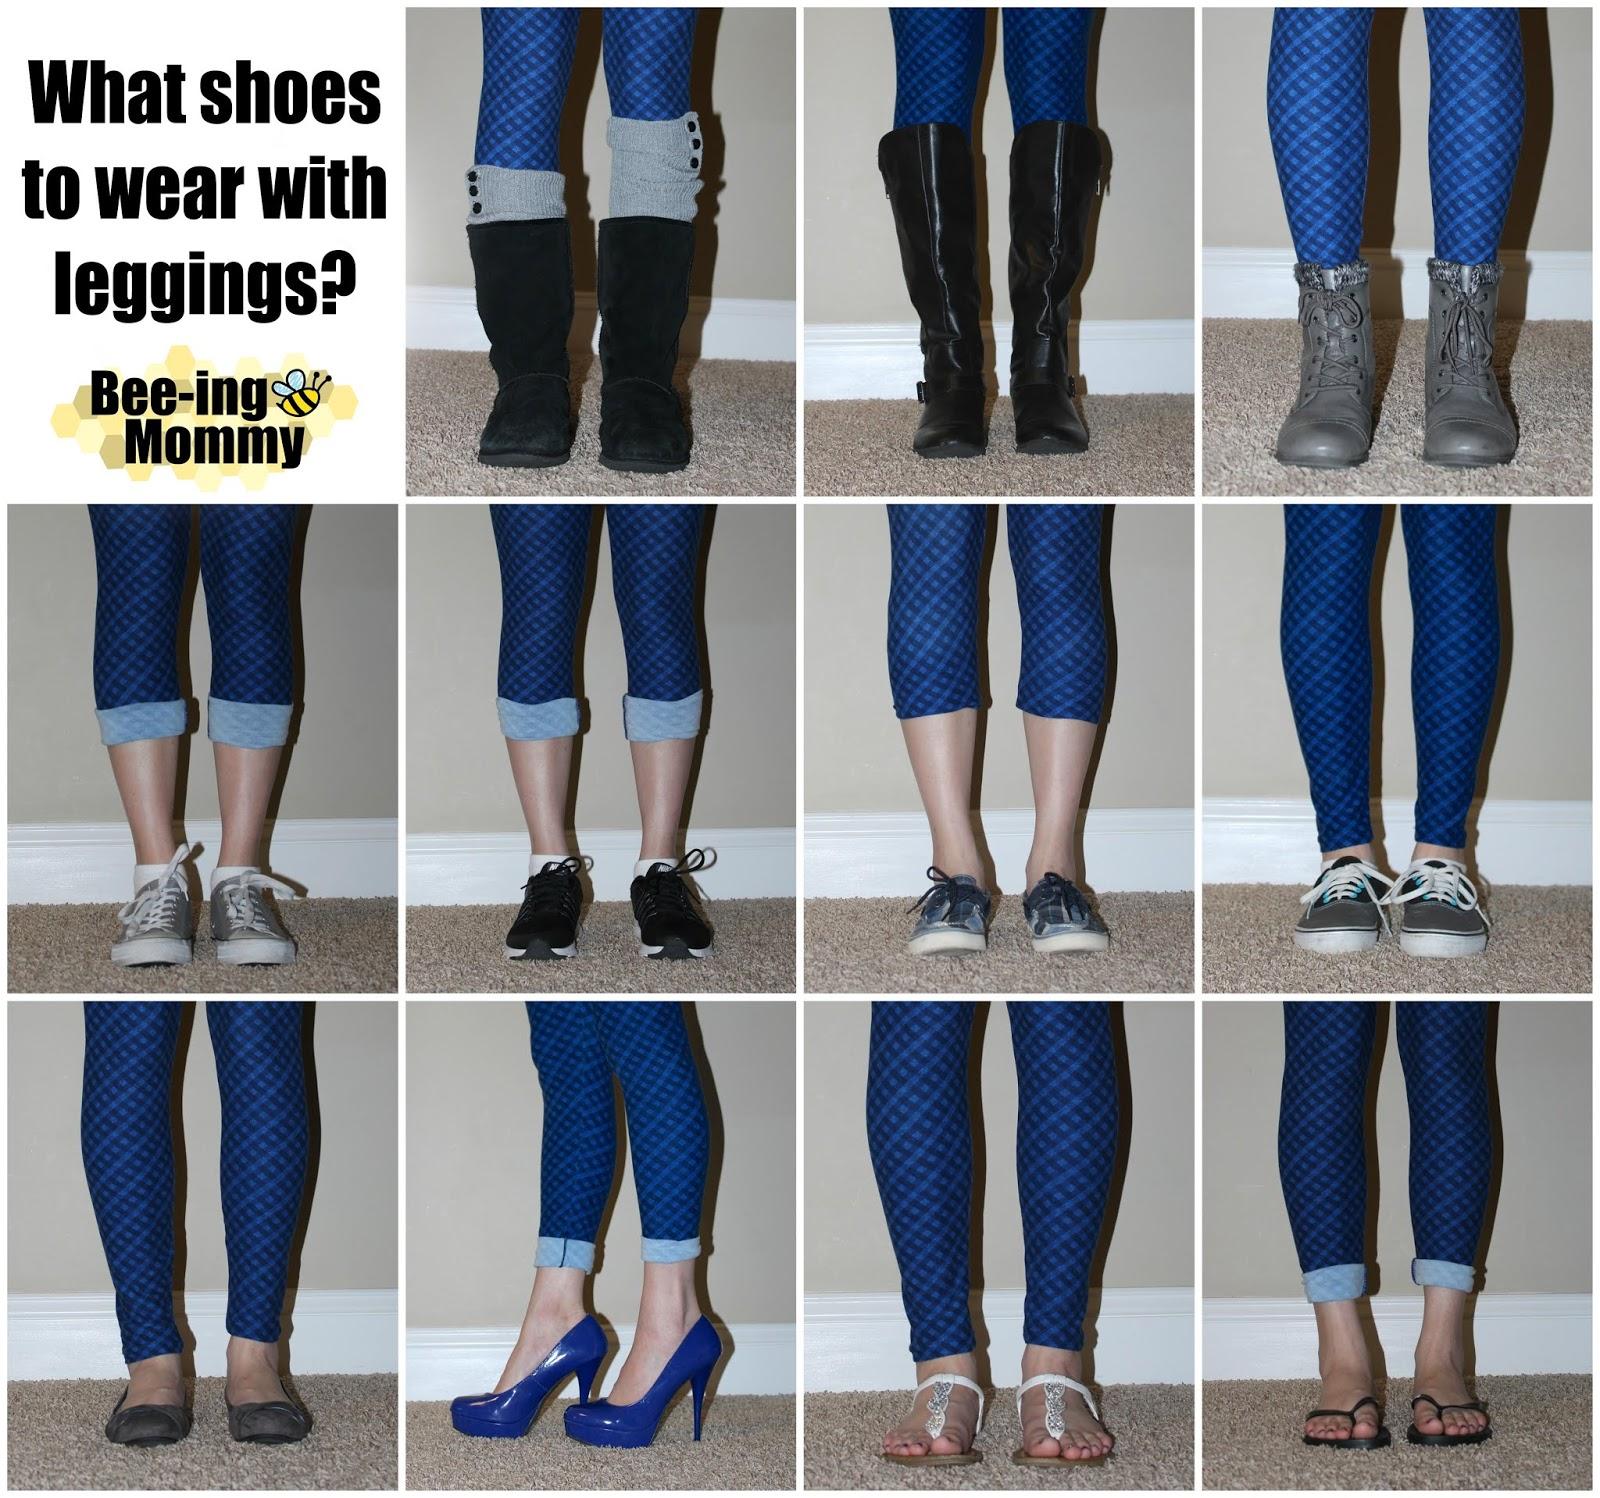 659b5e0b432 LulaRoe Part 2: Leggings - sizes, styling tips, legging hacks, Q&A